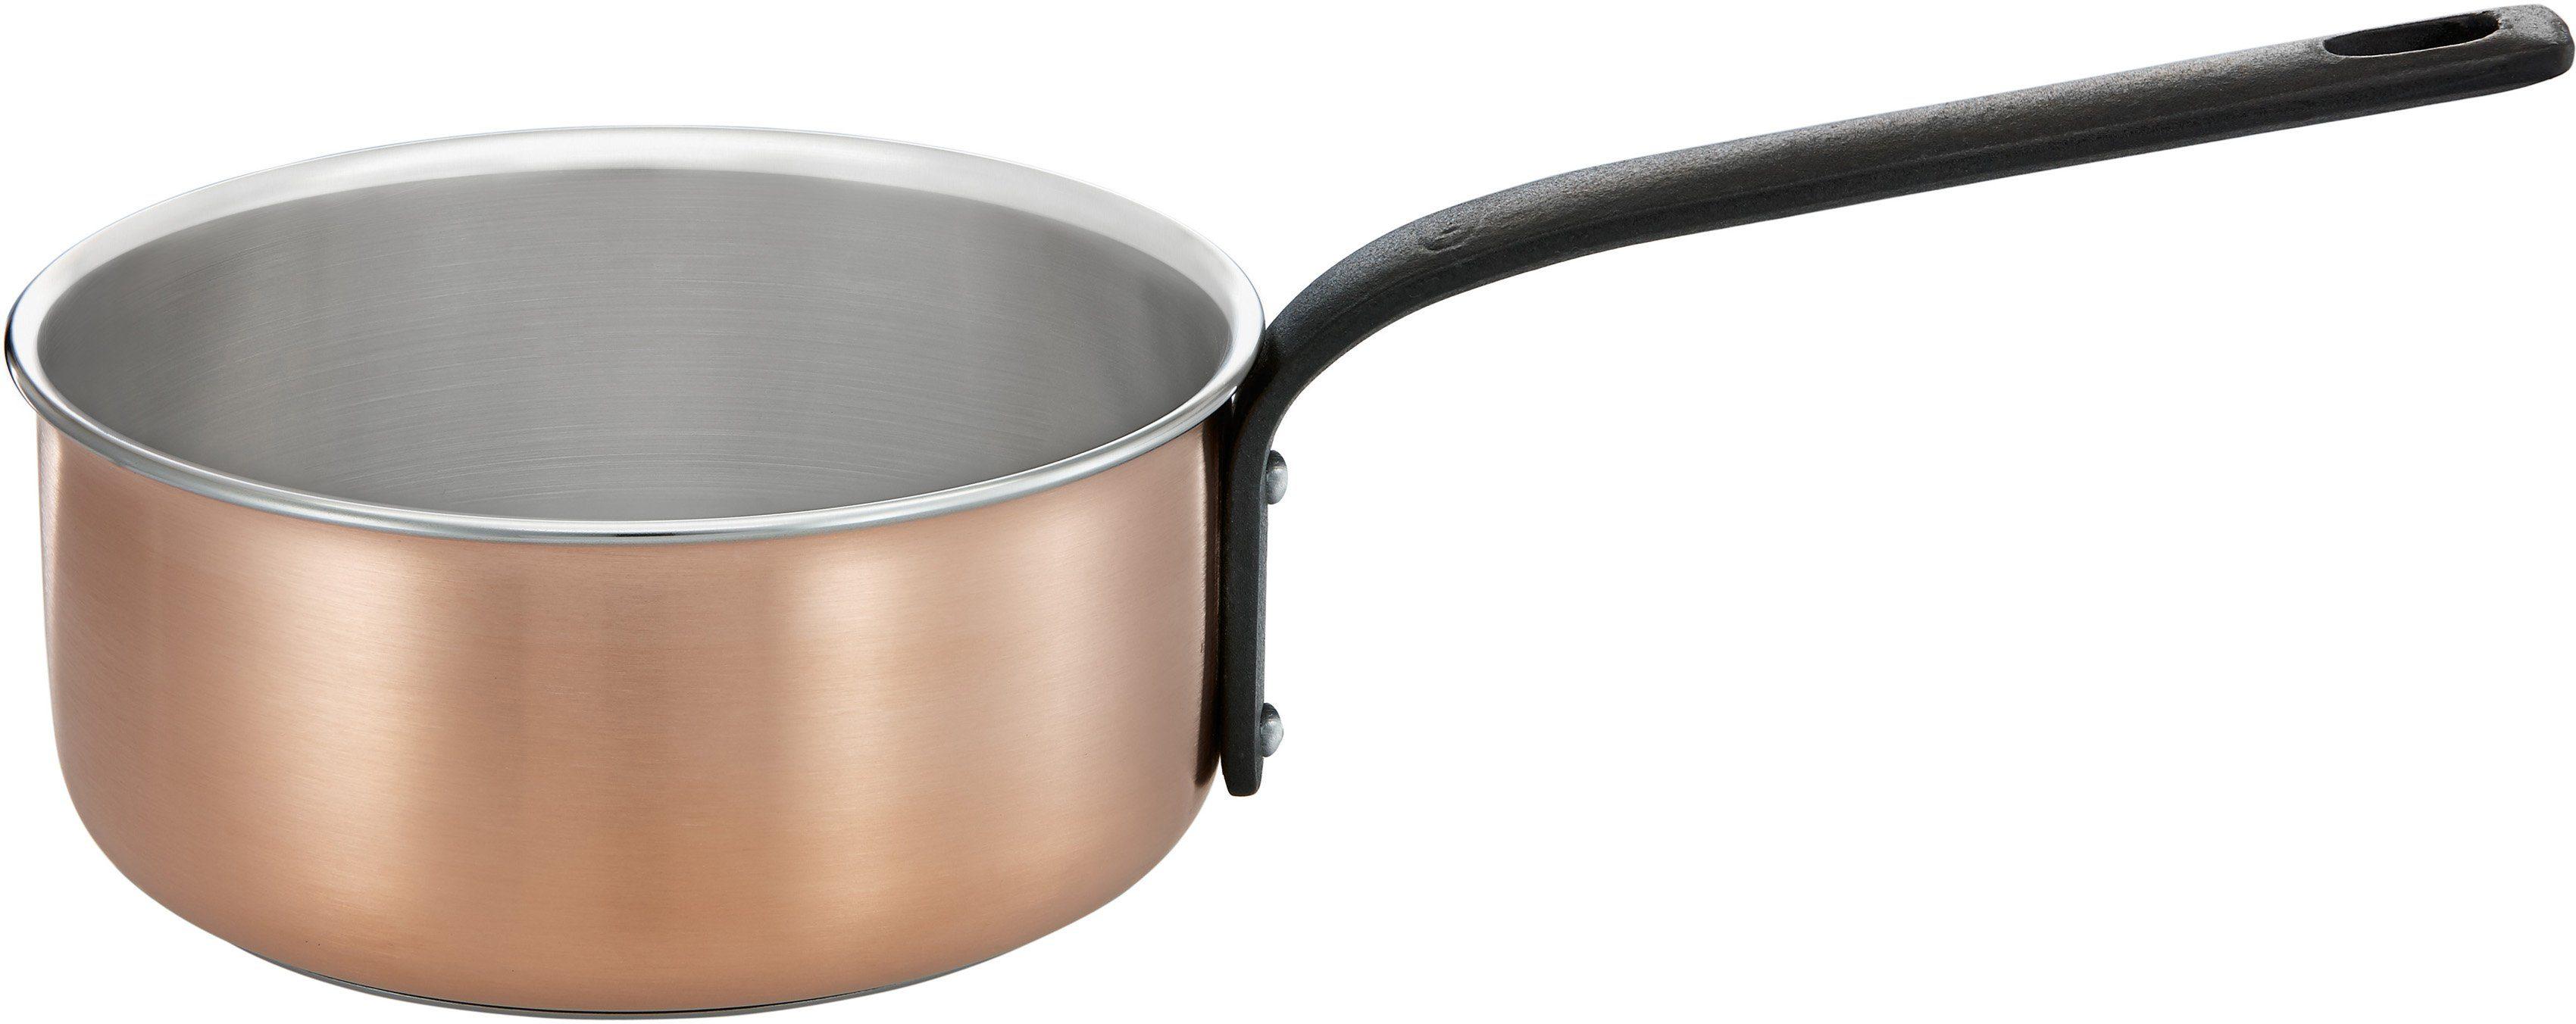 RÖSLE Stielkasserolle, Edelstahl/Aluminium, Kupfer, Induktion, 16 cm, »CHALET«